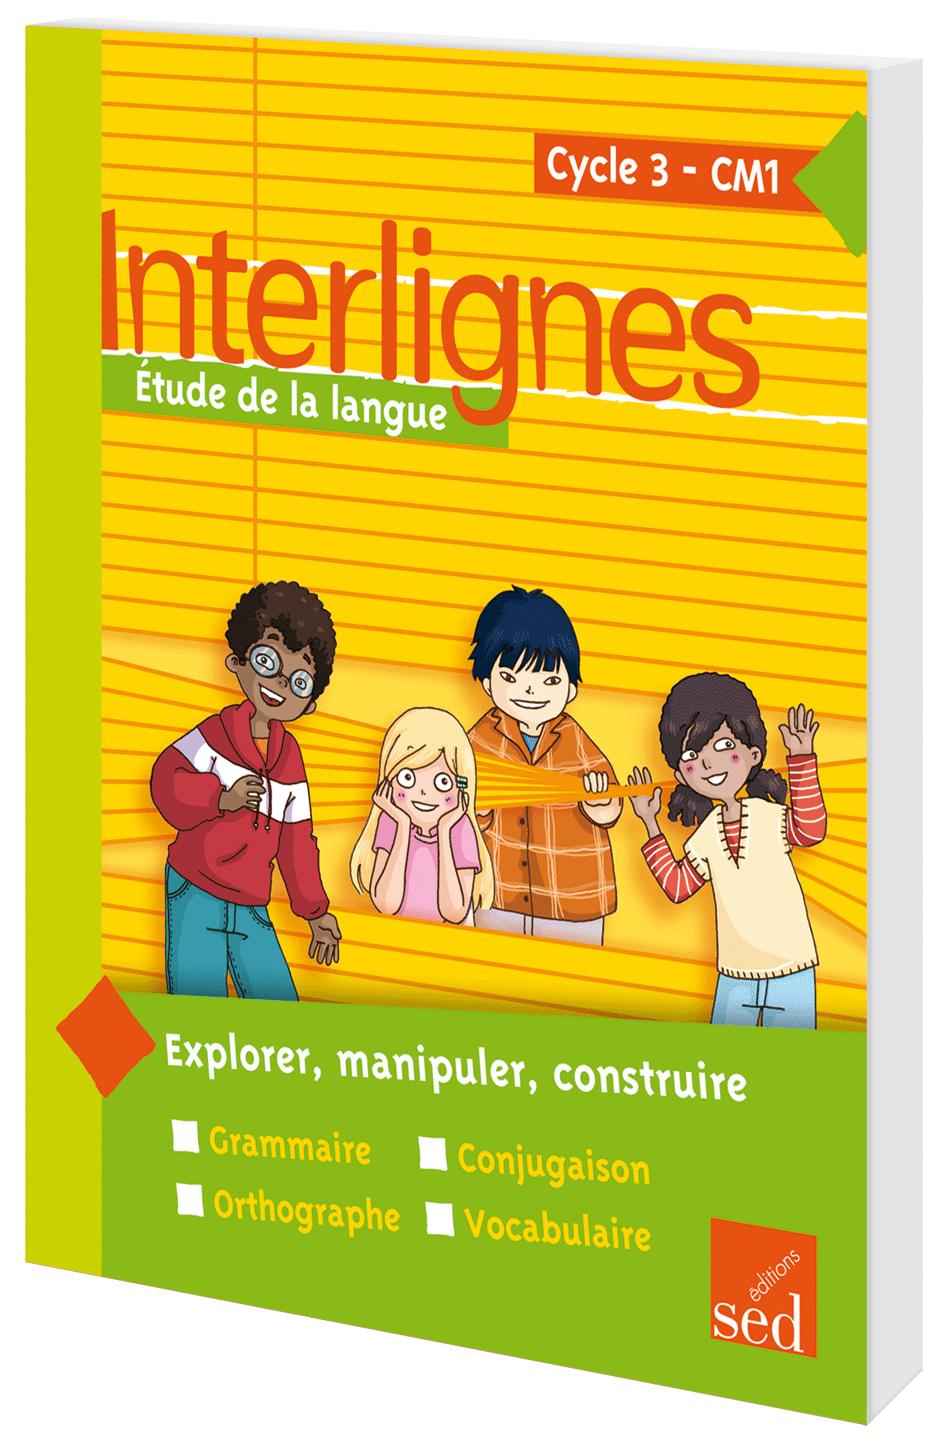 INTERLIGNES ETUDE DE LA LANGUE - MANUEL DE L'ELEVE CM1